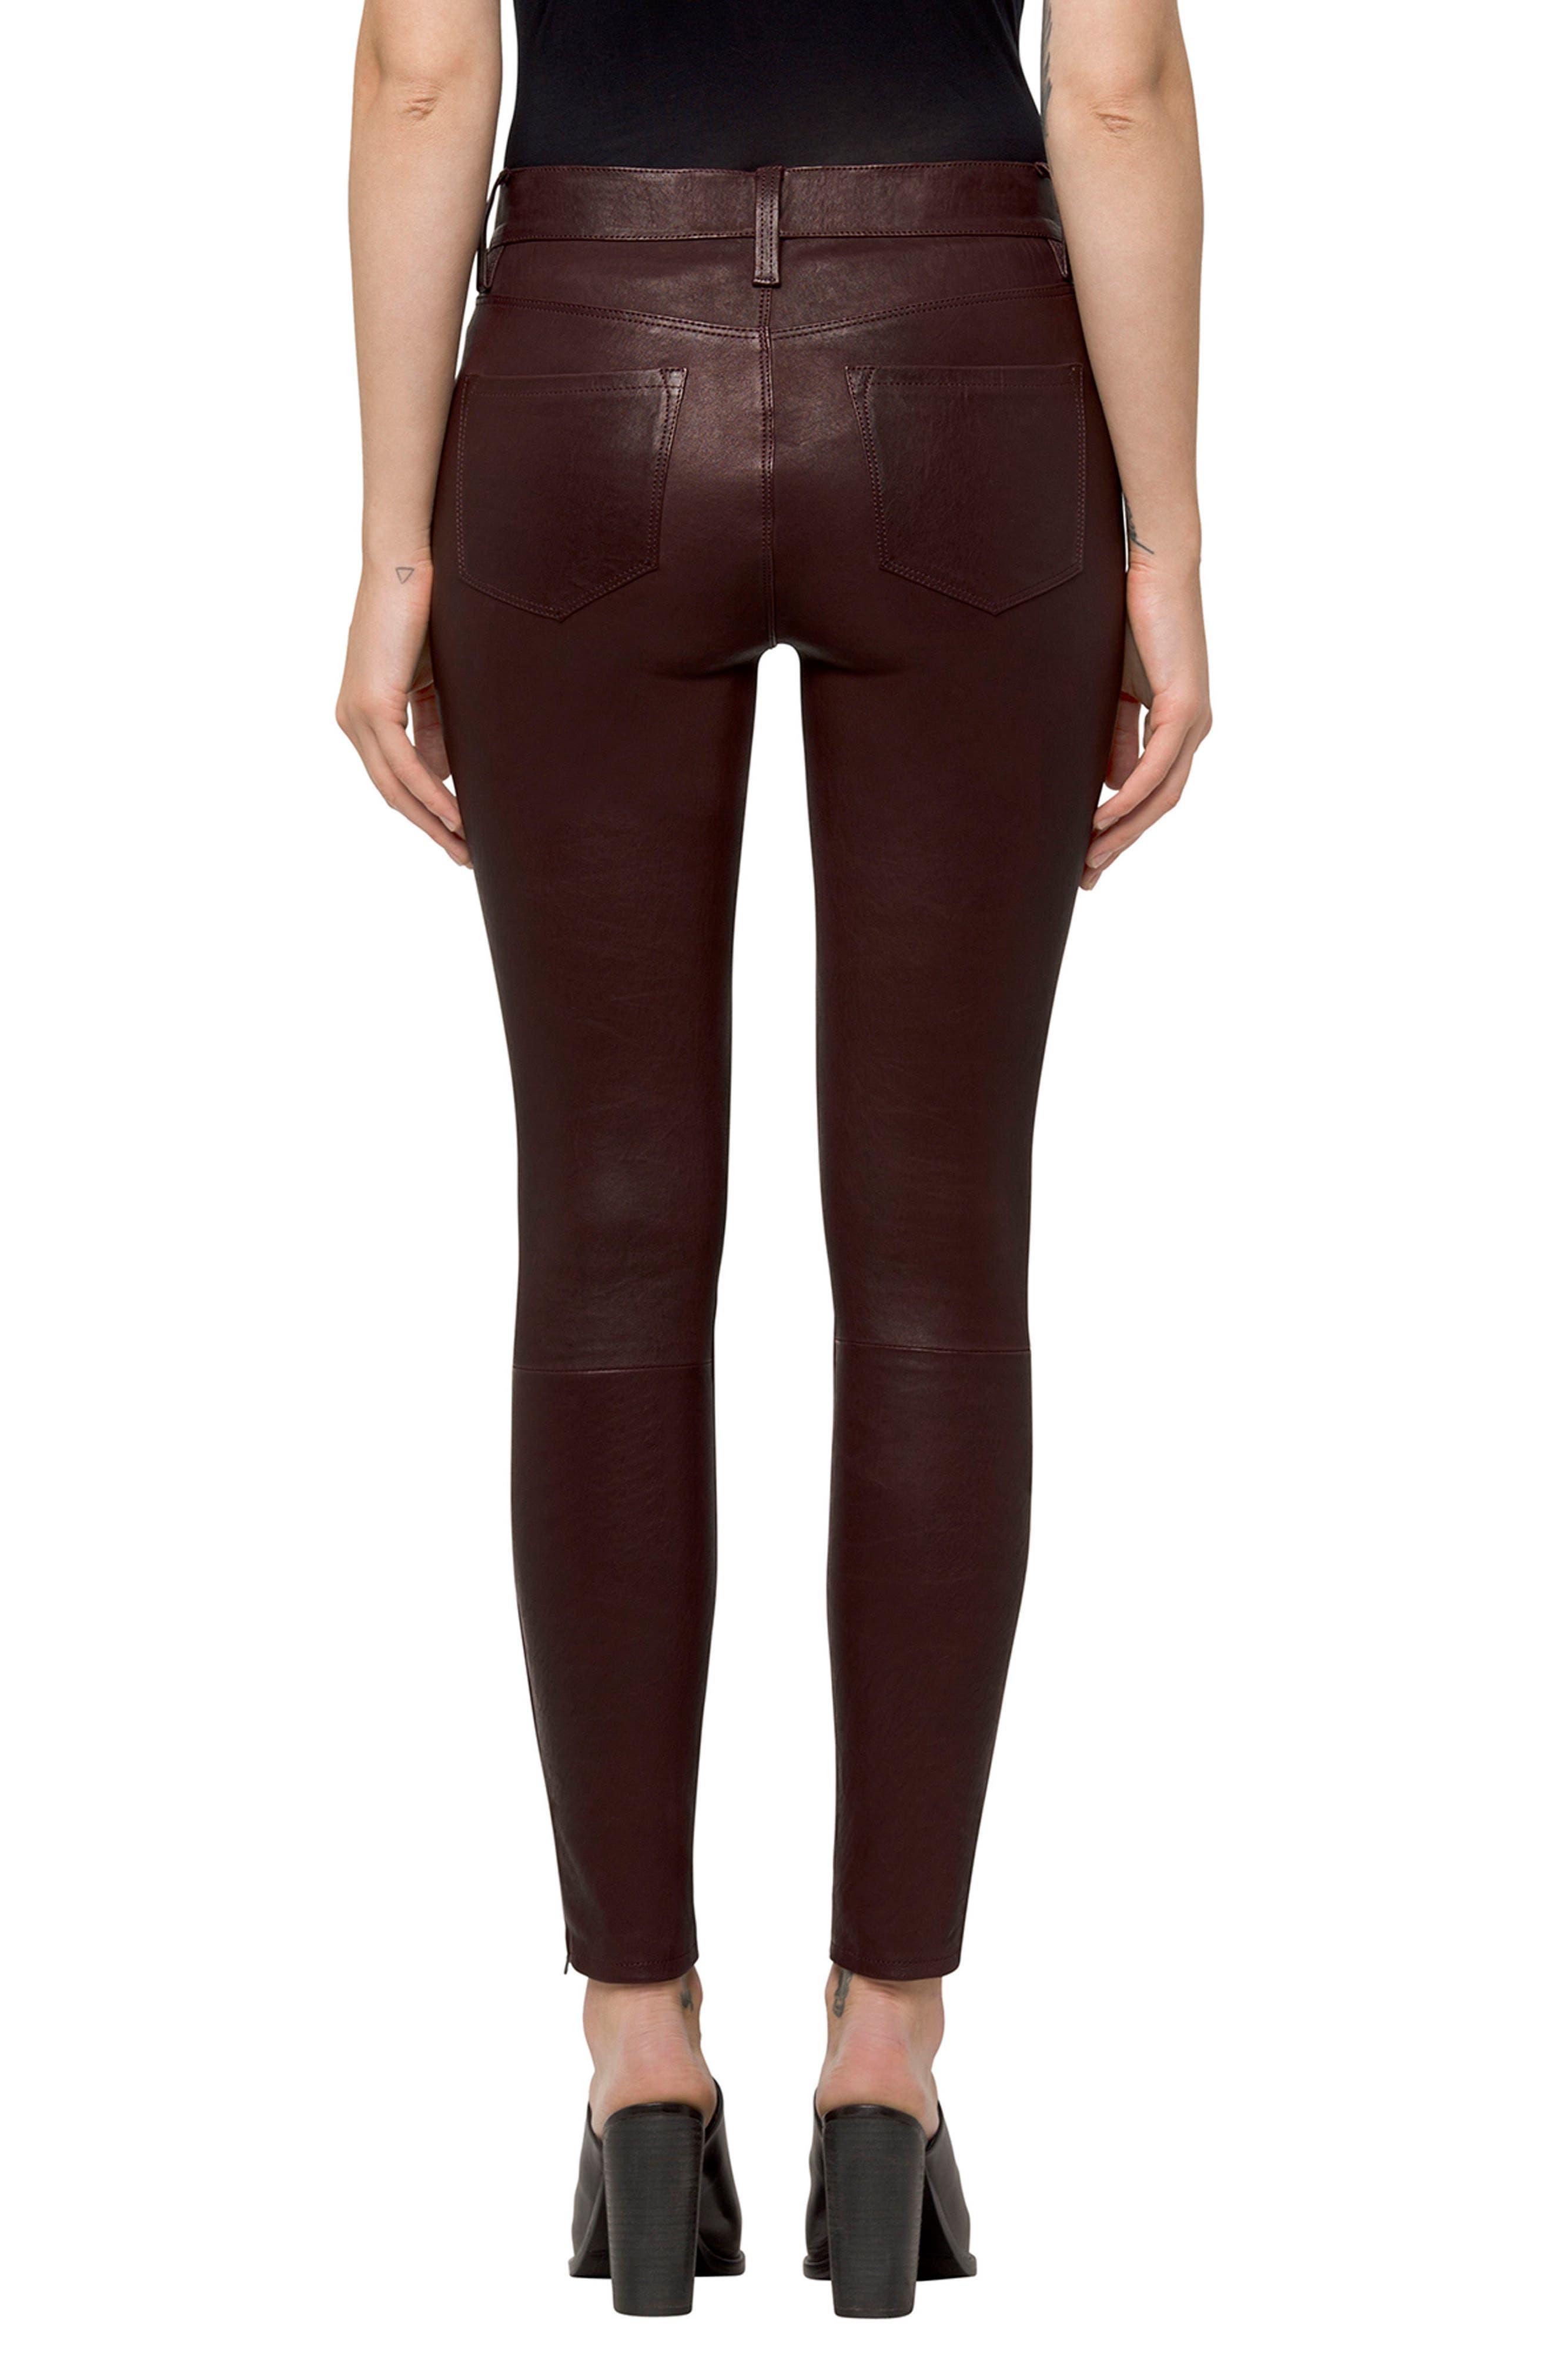 '8001' Lambskin Leather Pants,                             Alternate thumbnail 29, color,